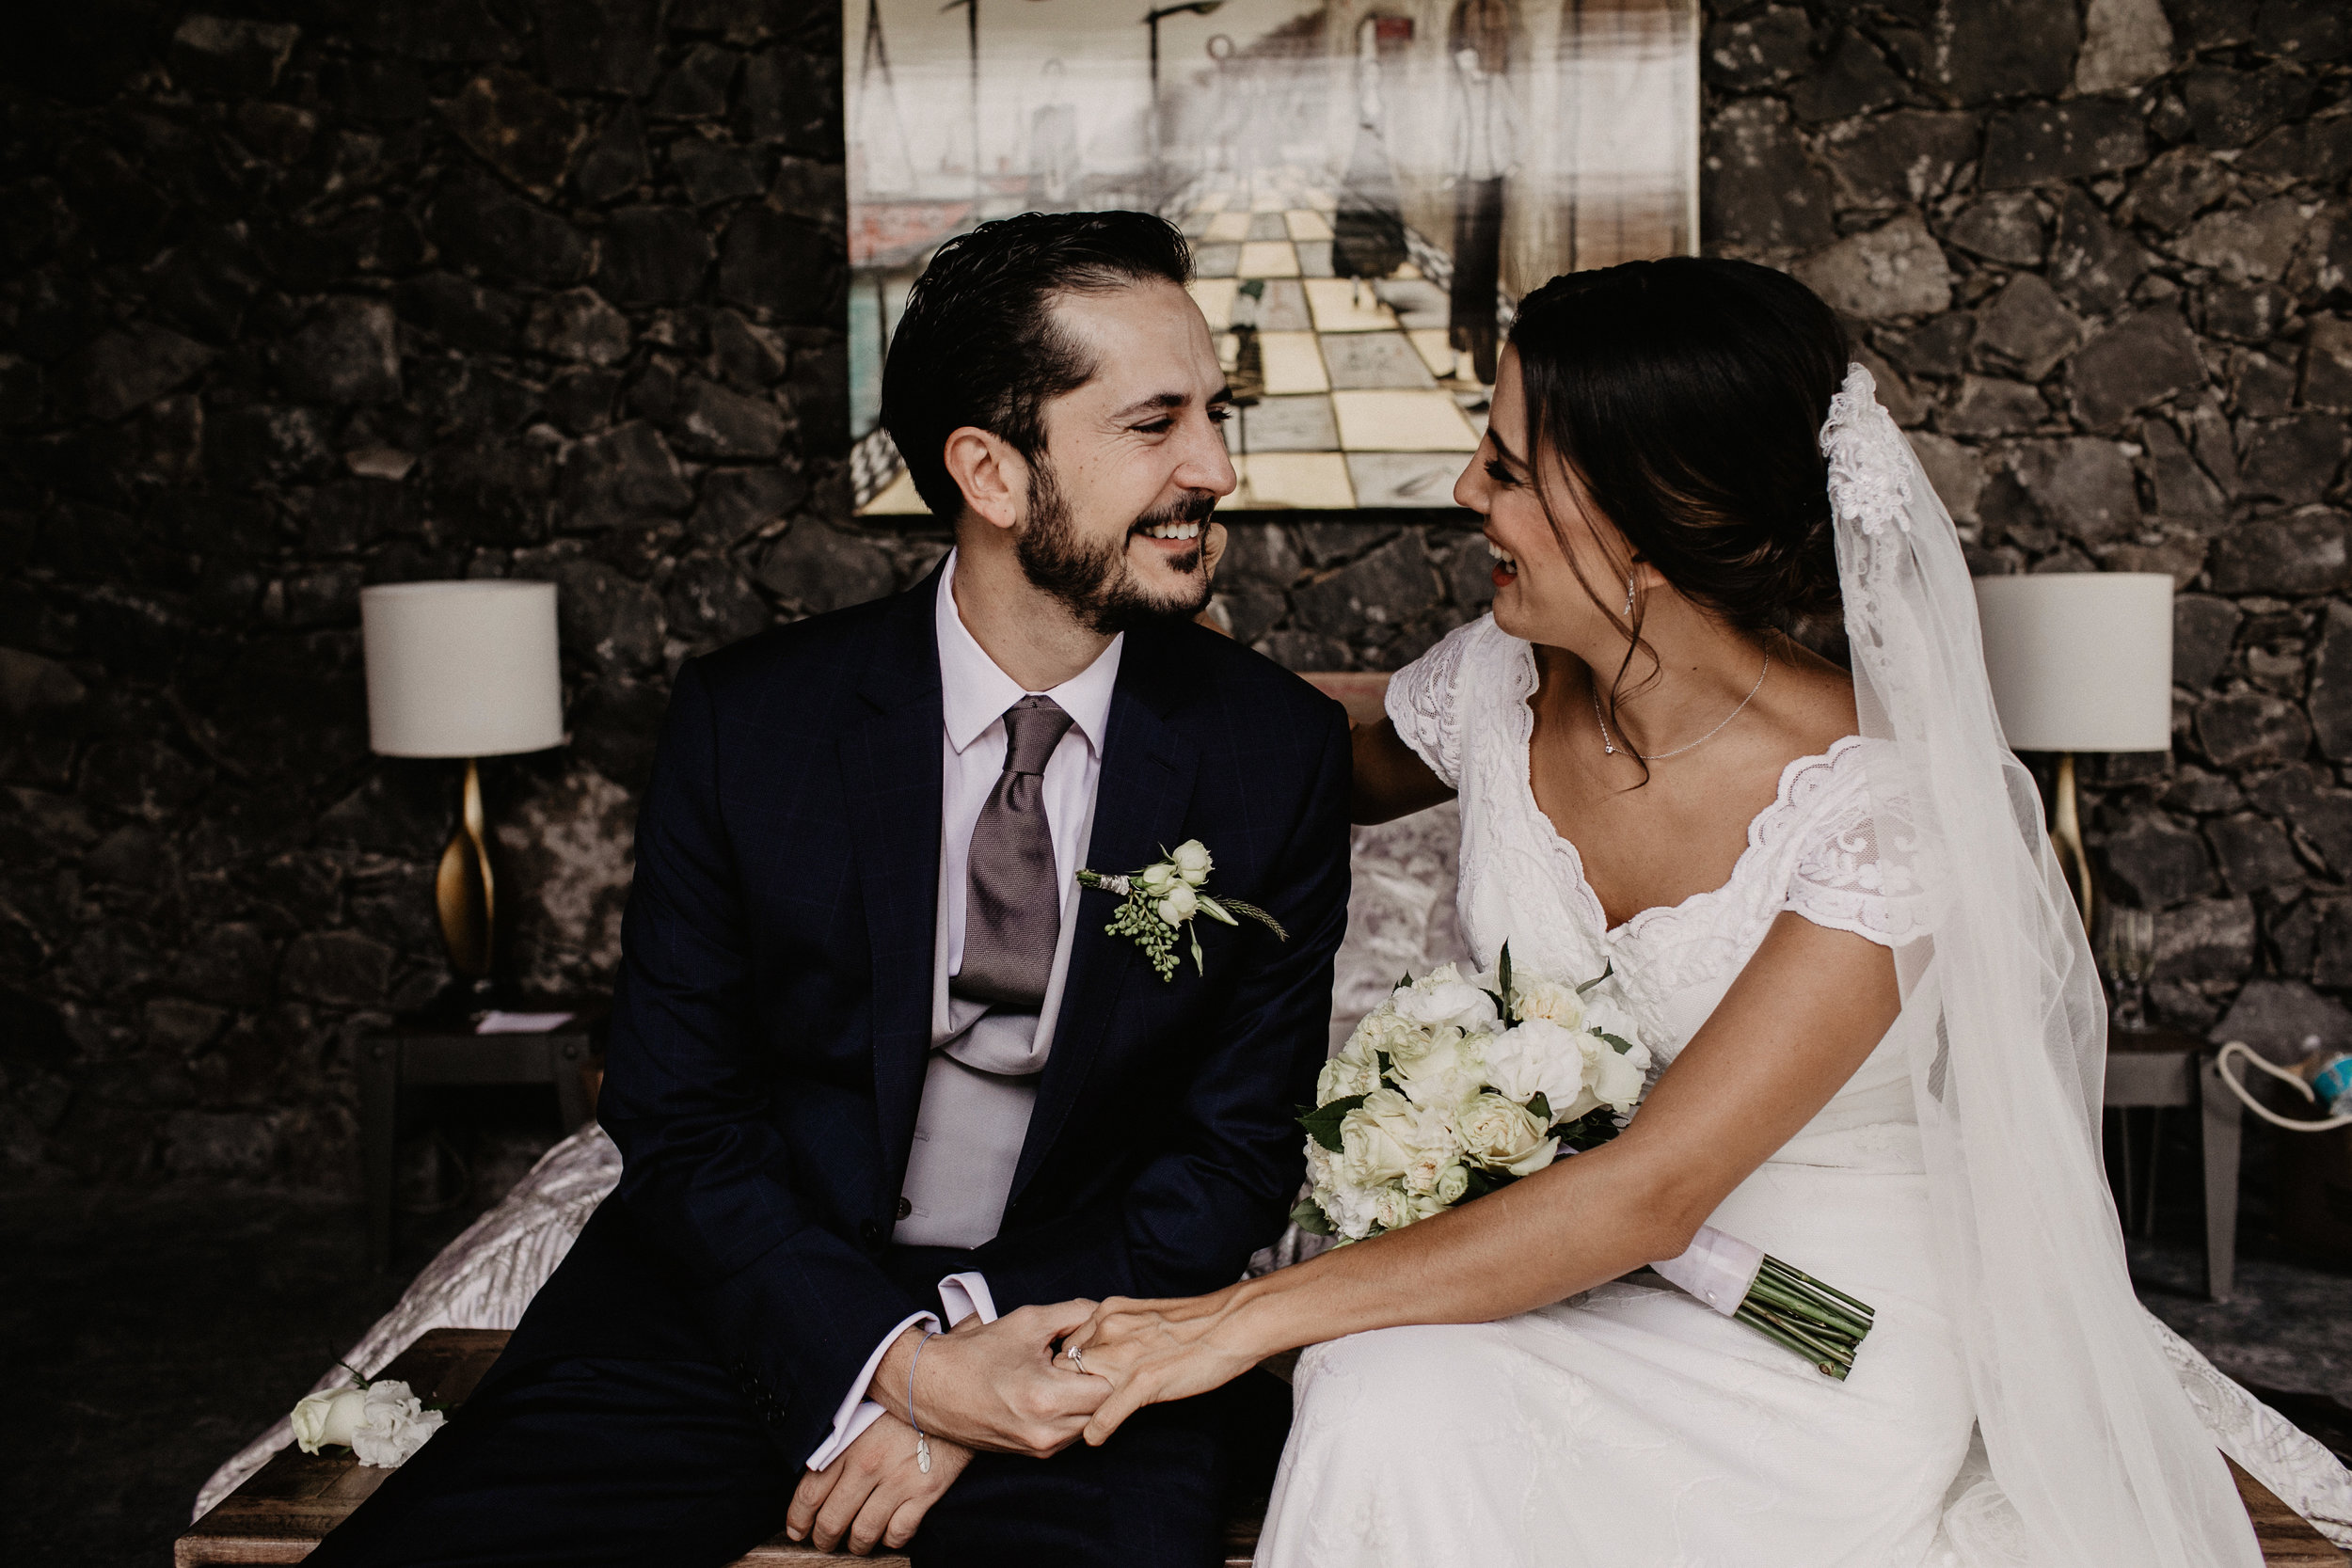 alfonso_flores_destination_wedding_photographer_pau_alonso_266.JPG